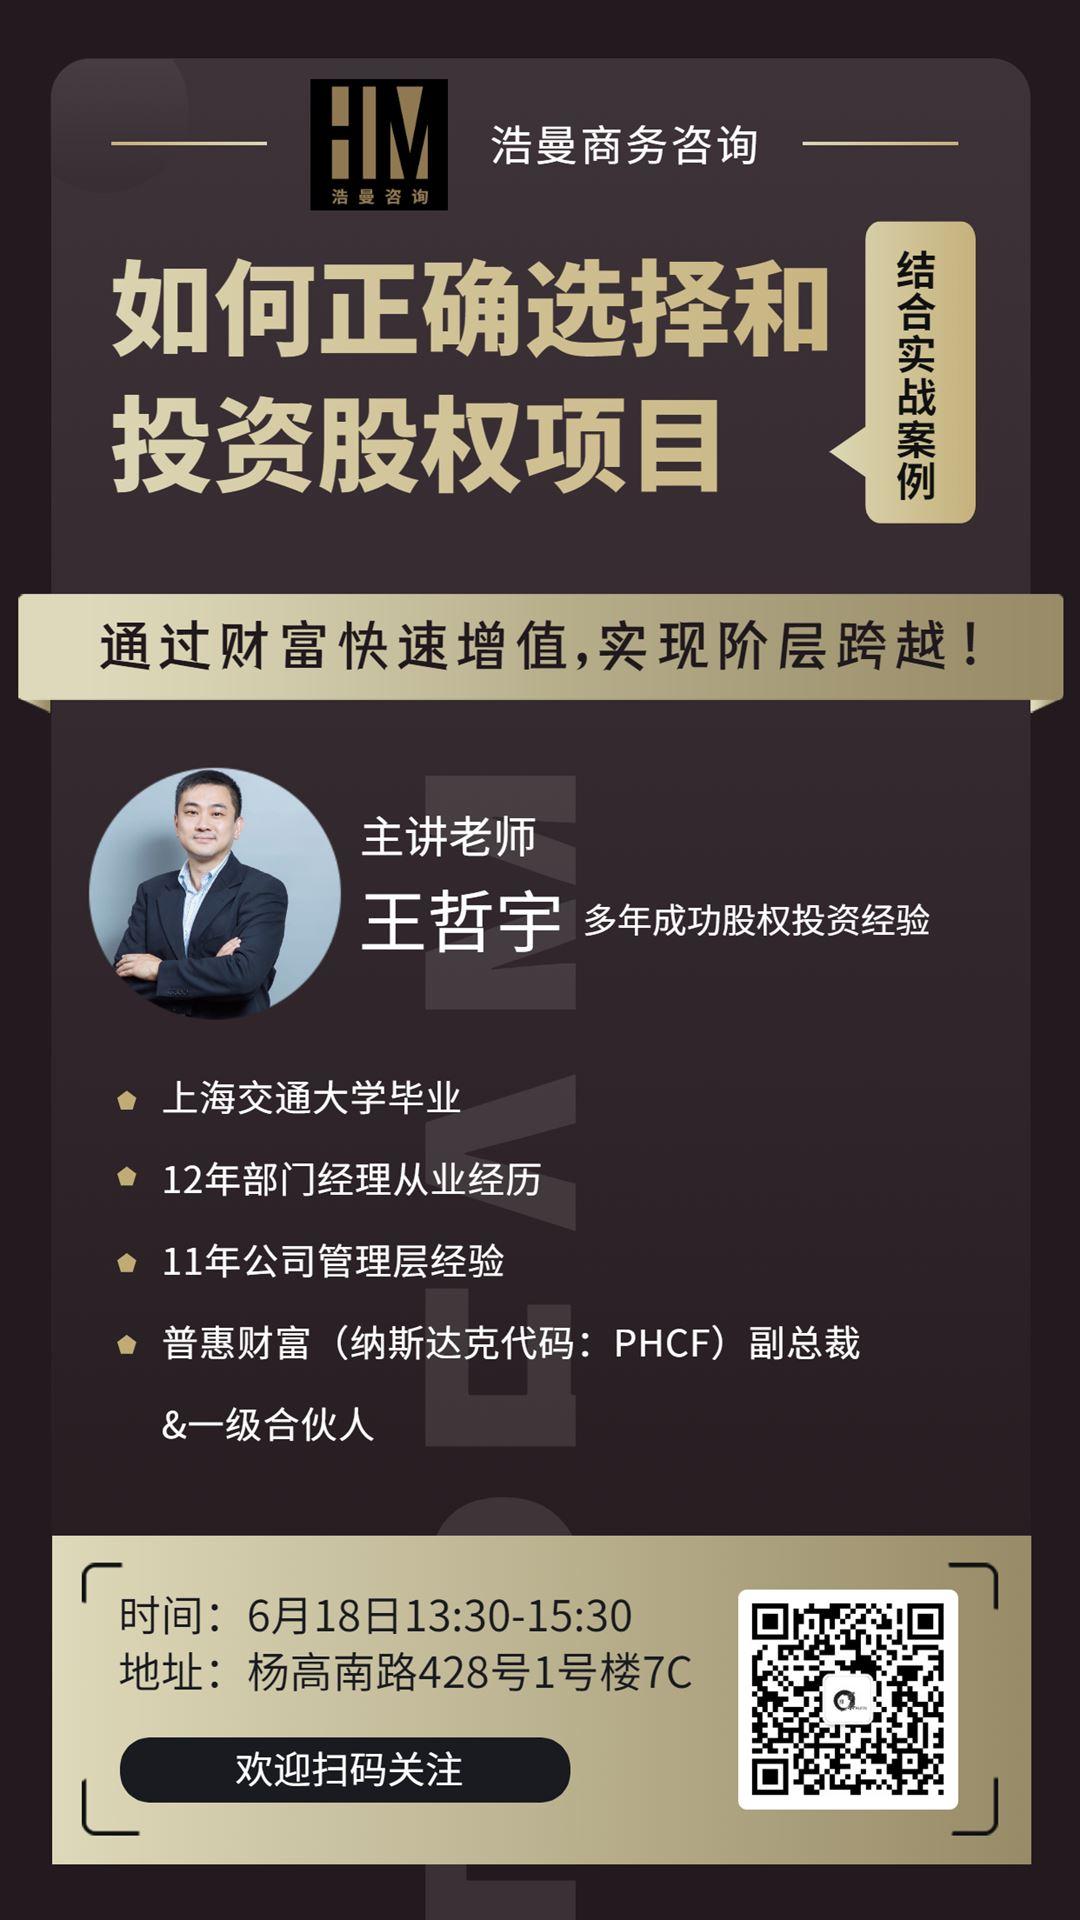 http://www.huodongxing.com/file/20210318/6744094471948/644170503448177.jpg